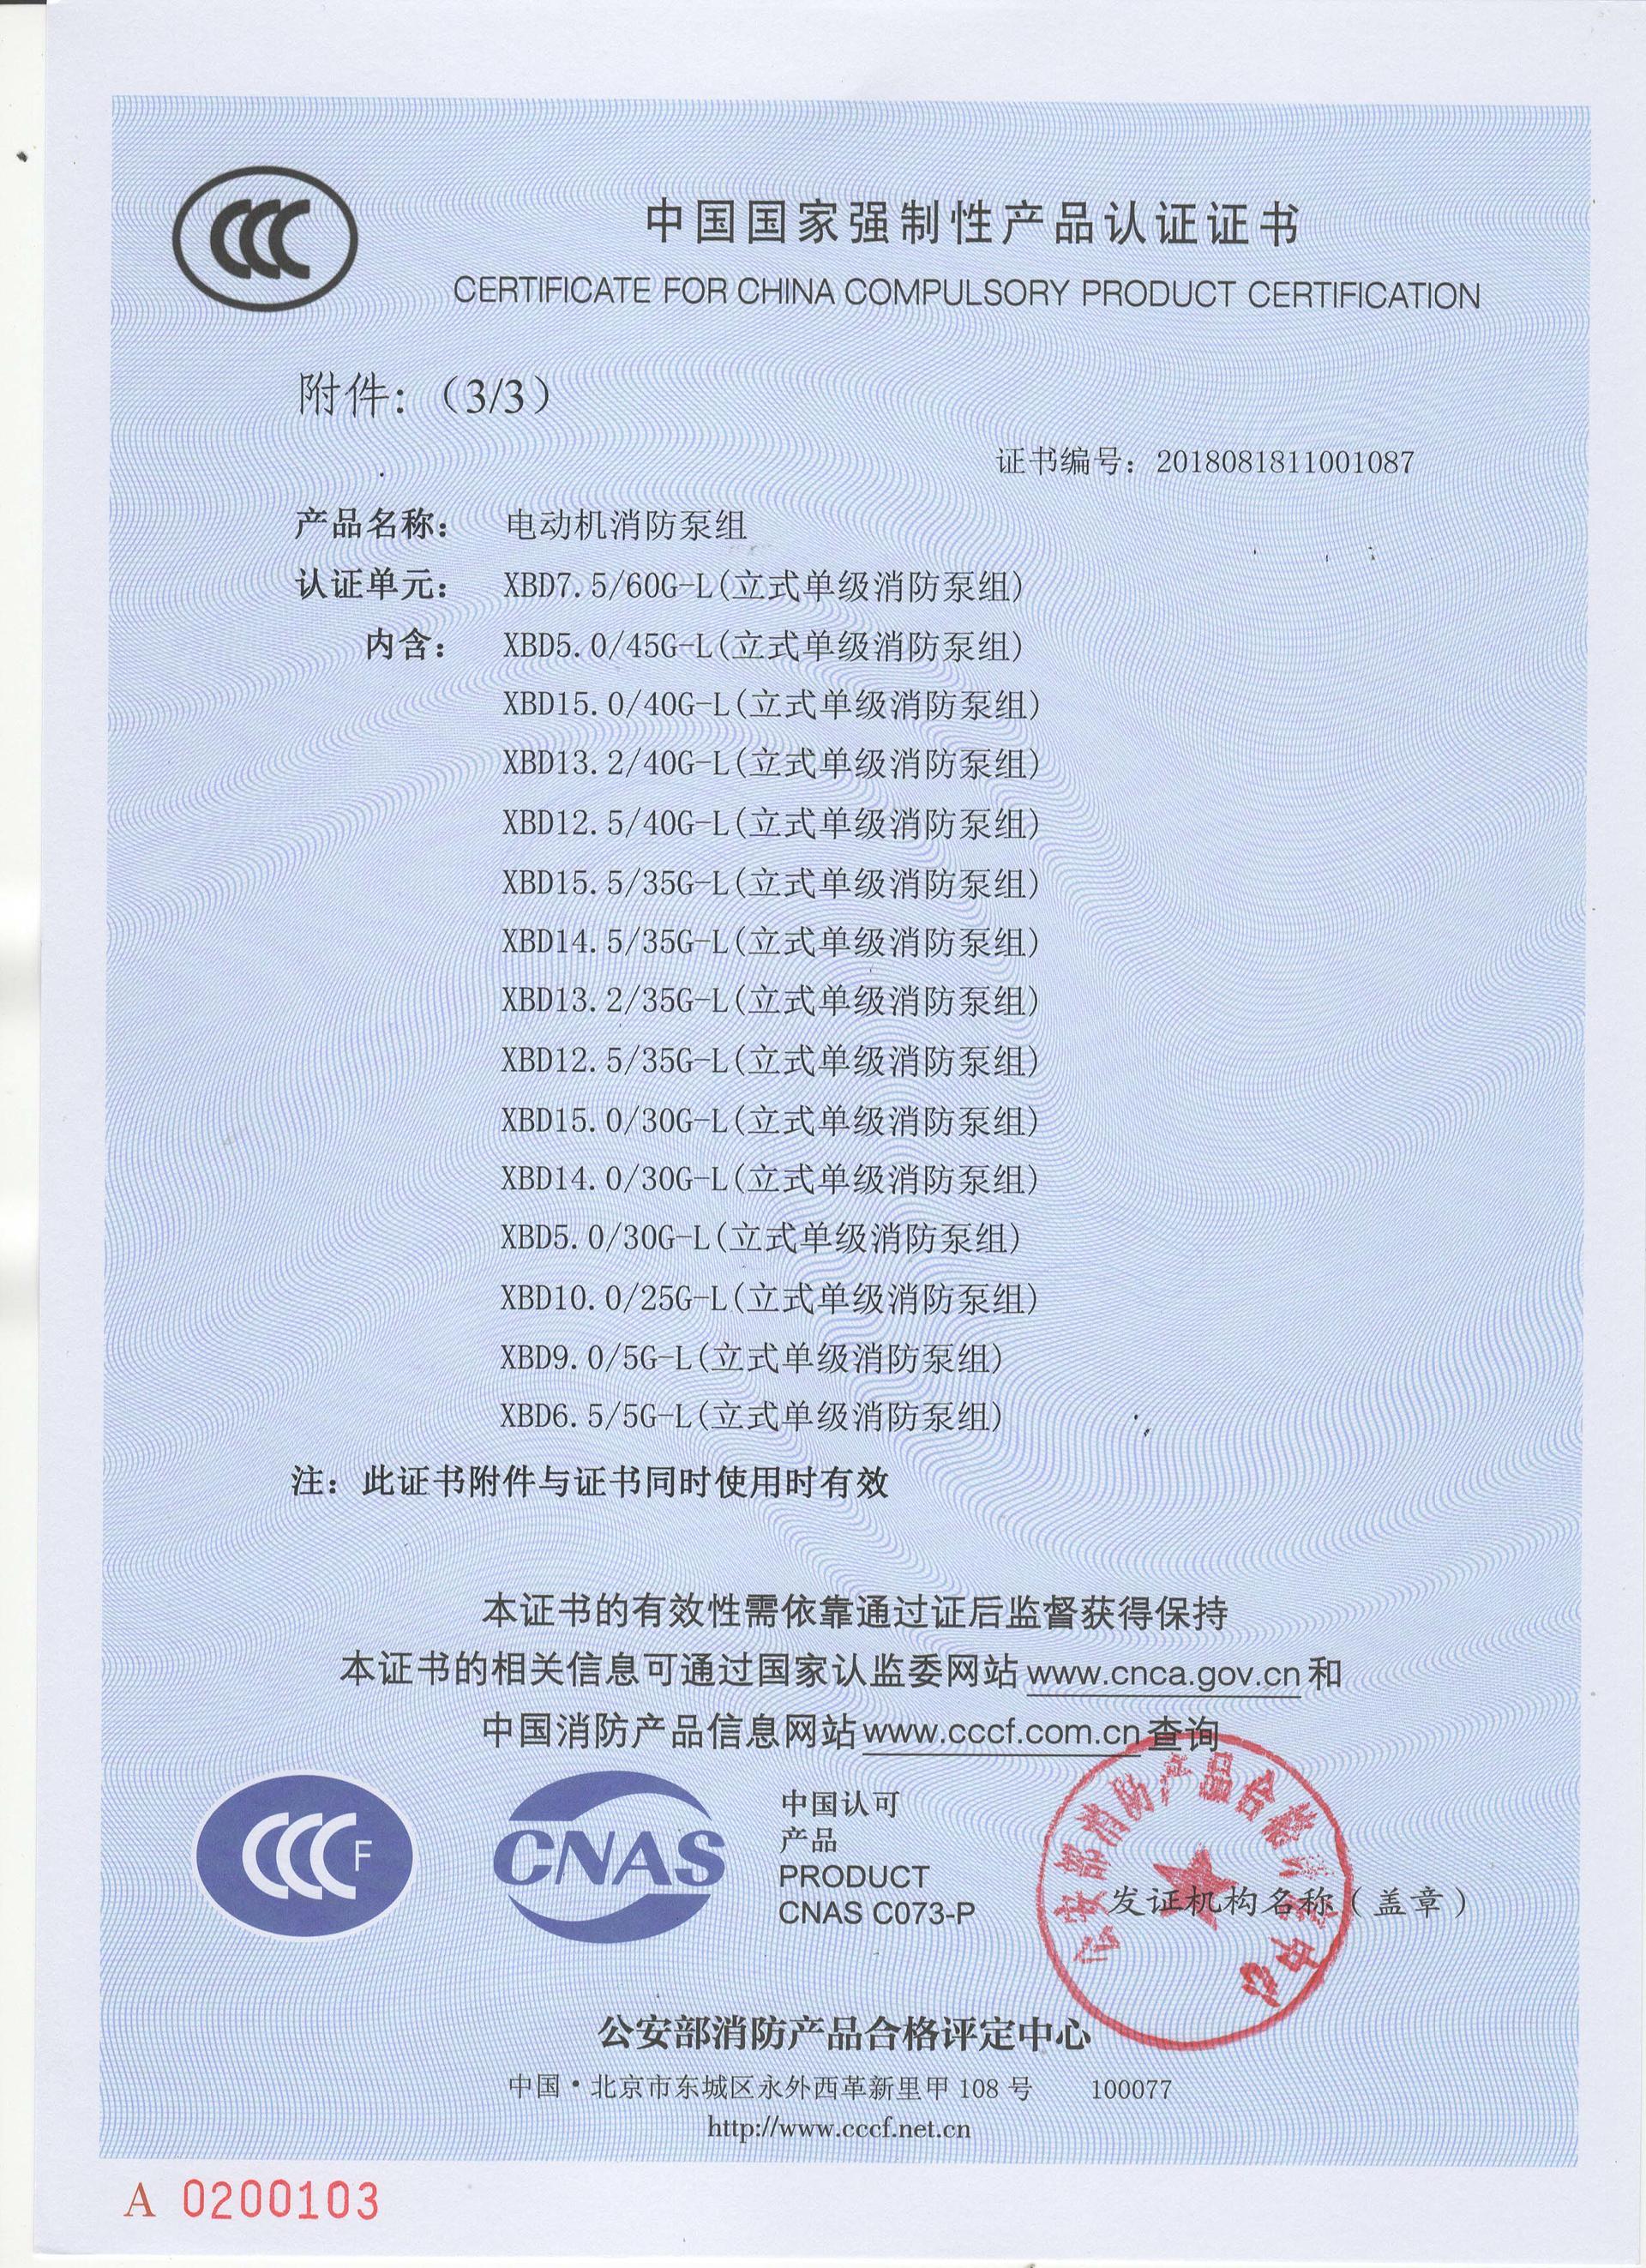 CCCF 001.jpg